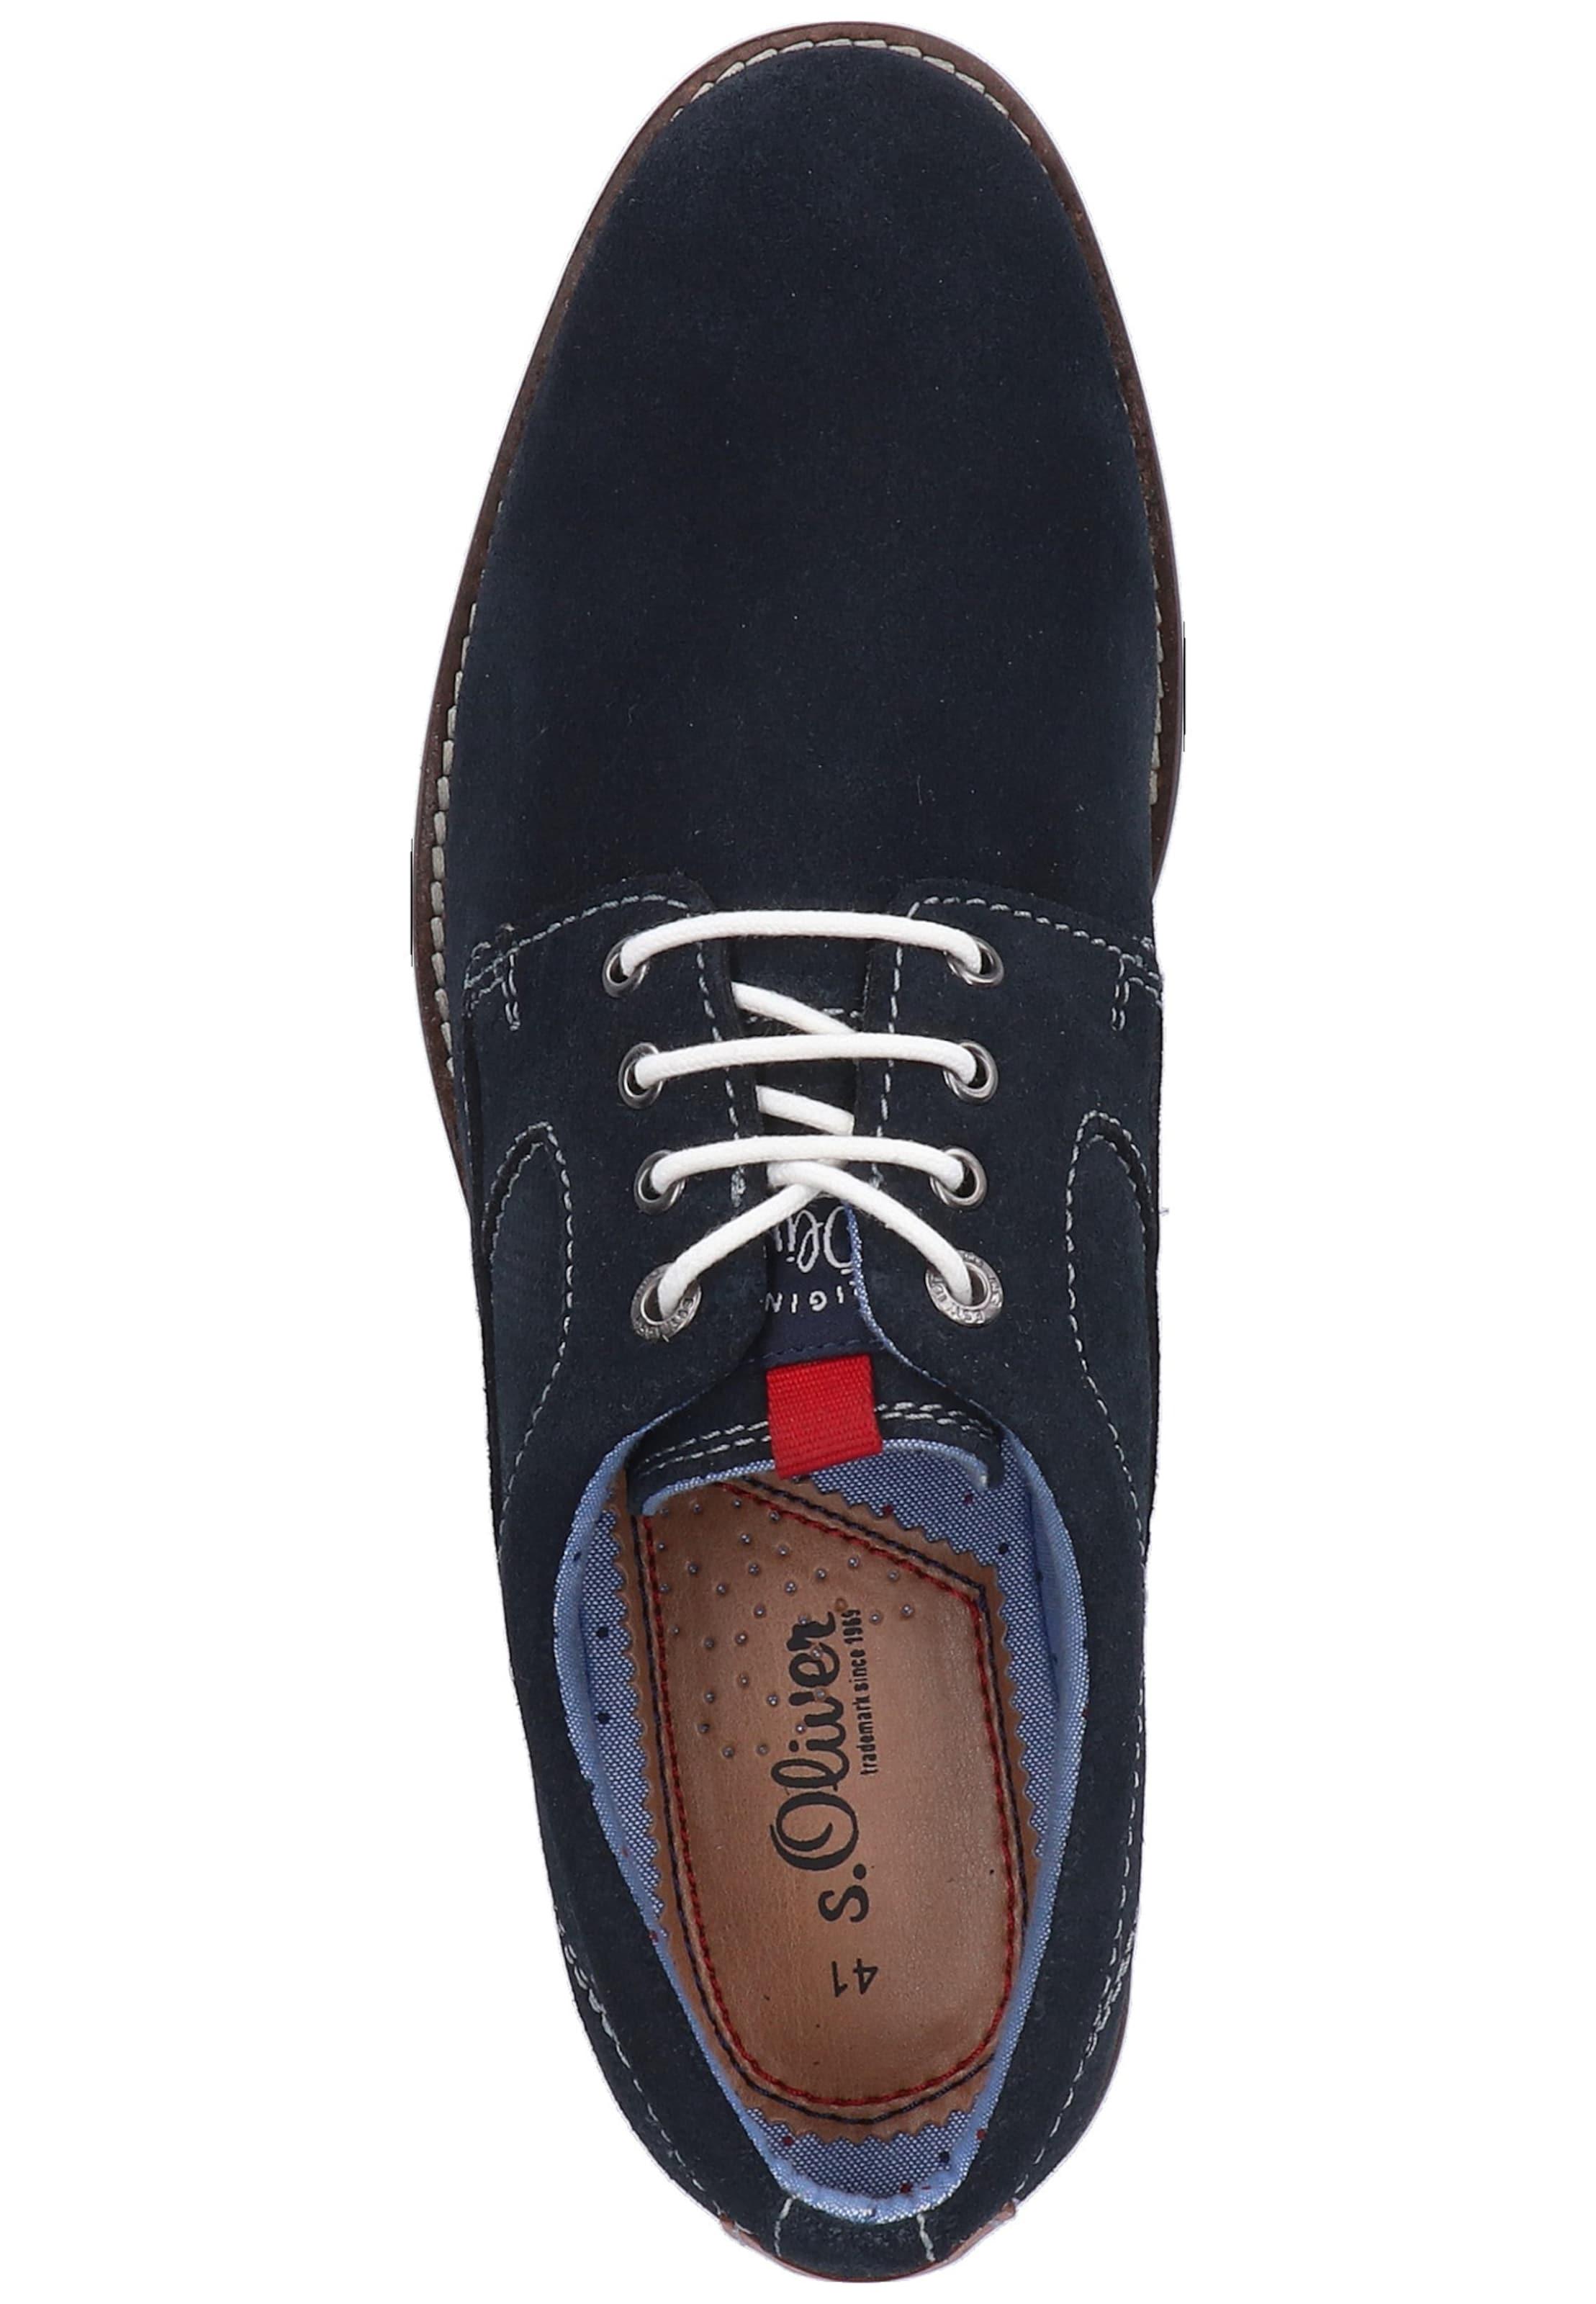 Chaussure S oliver Red Rouge En Label Lacets MarineMarron À Bleu 7Ygv6bfy